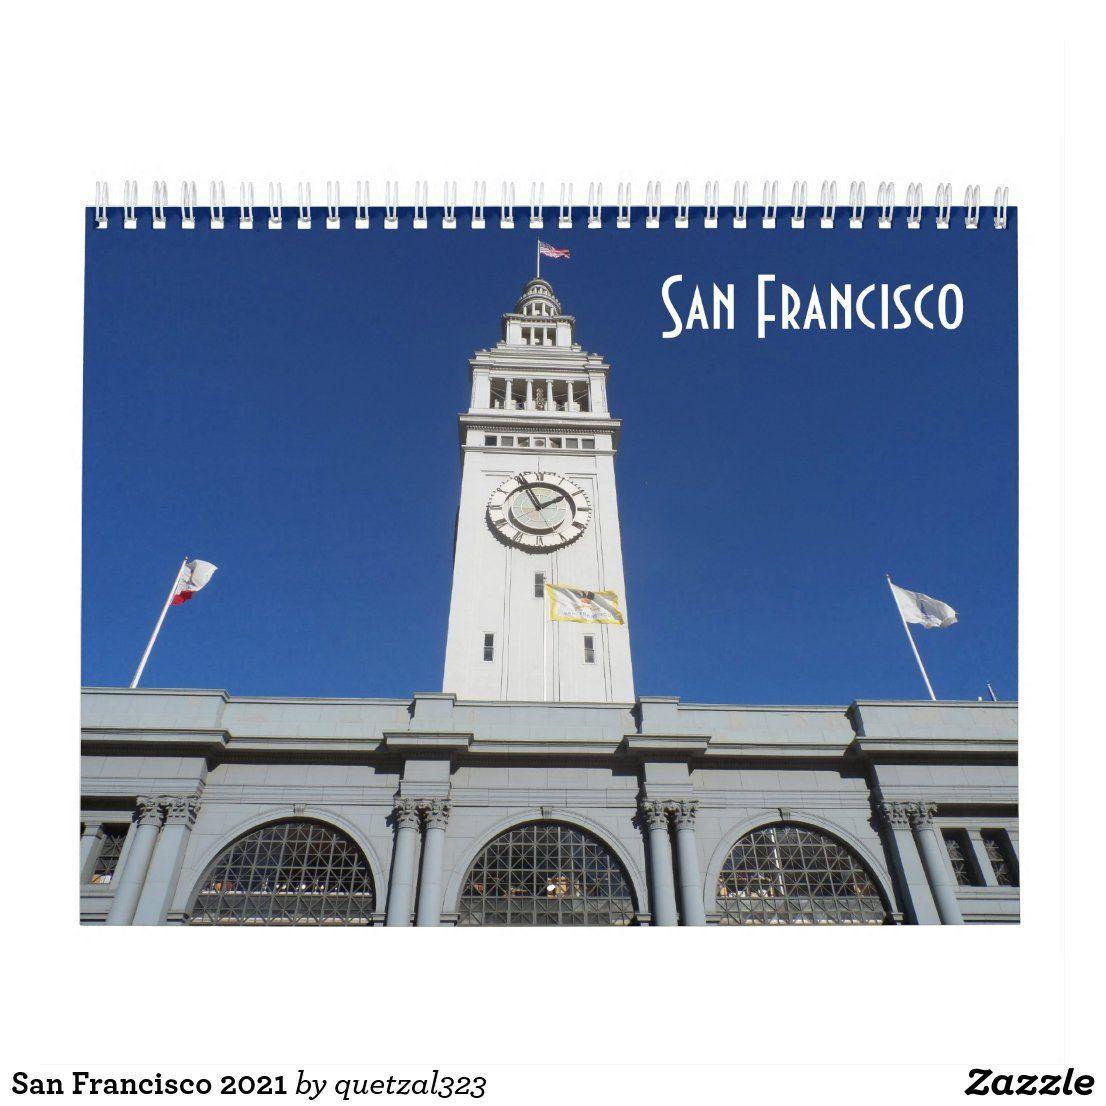 San Francisco Christmas Events 2021 San Francisco 2021 Calendar Zazzle Com 2021 Calendar Custom Holiday Card Holidays And Events